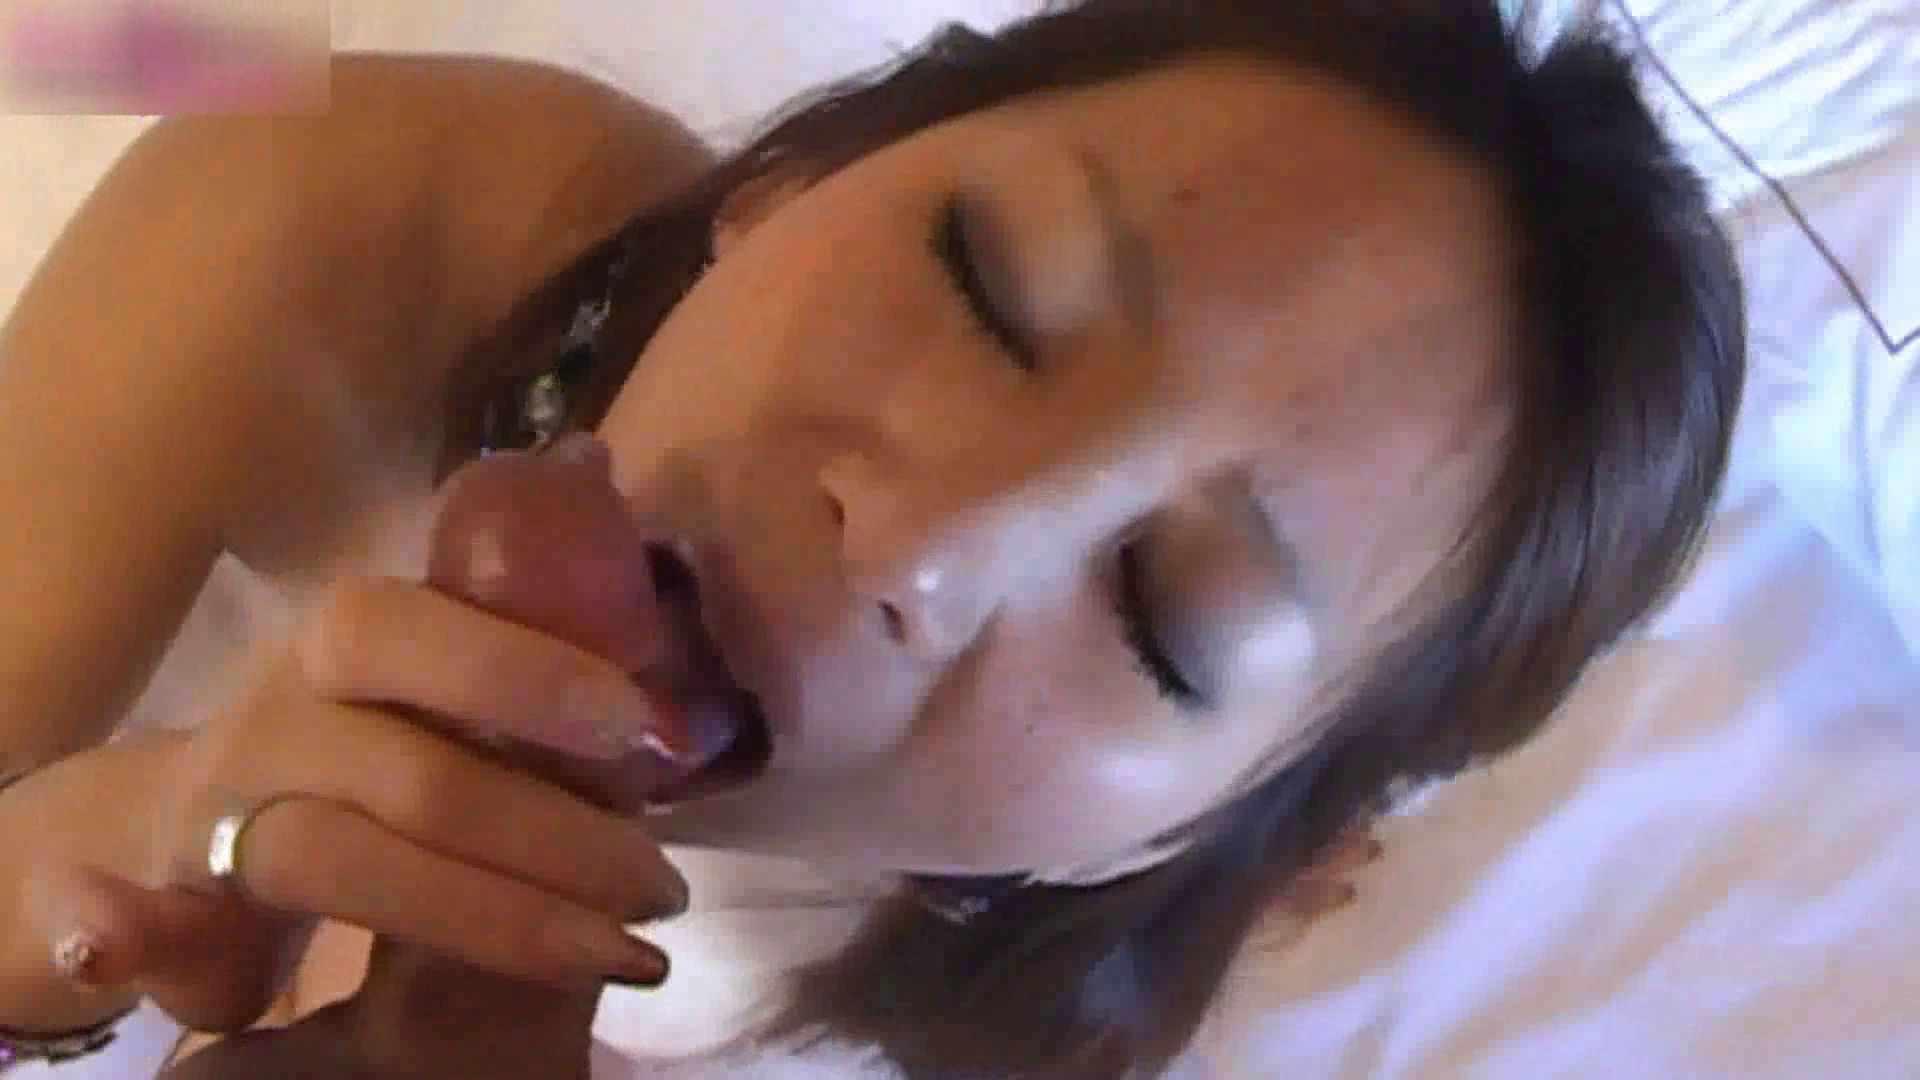 S級厳選美女ビッチガールVol.06 OLセックス | 美女ヌード  109画像 95